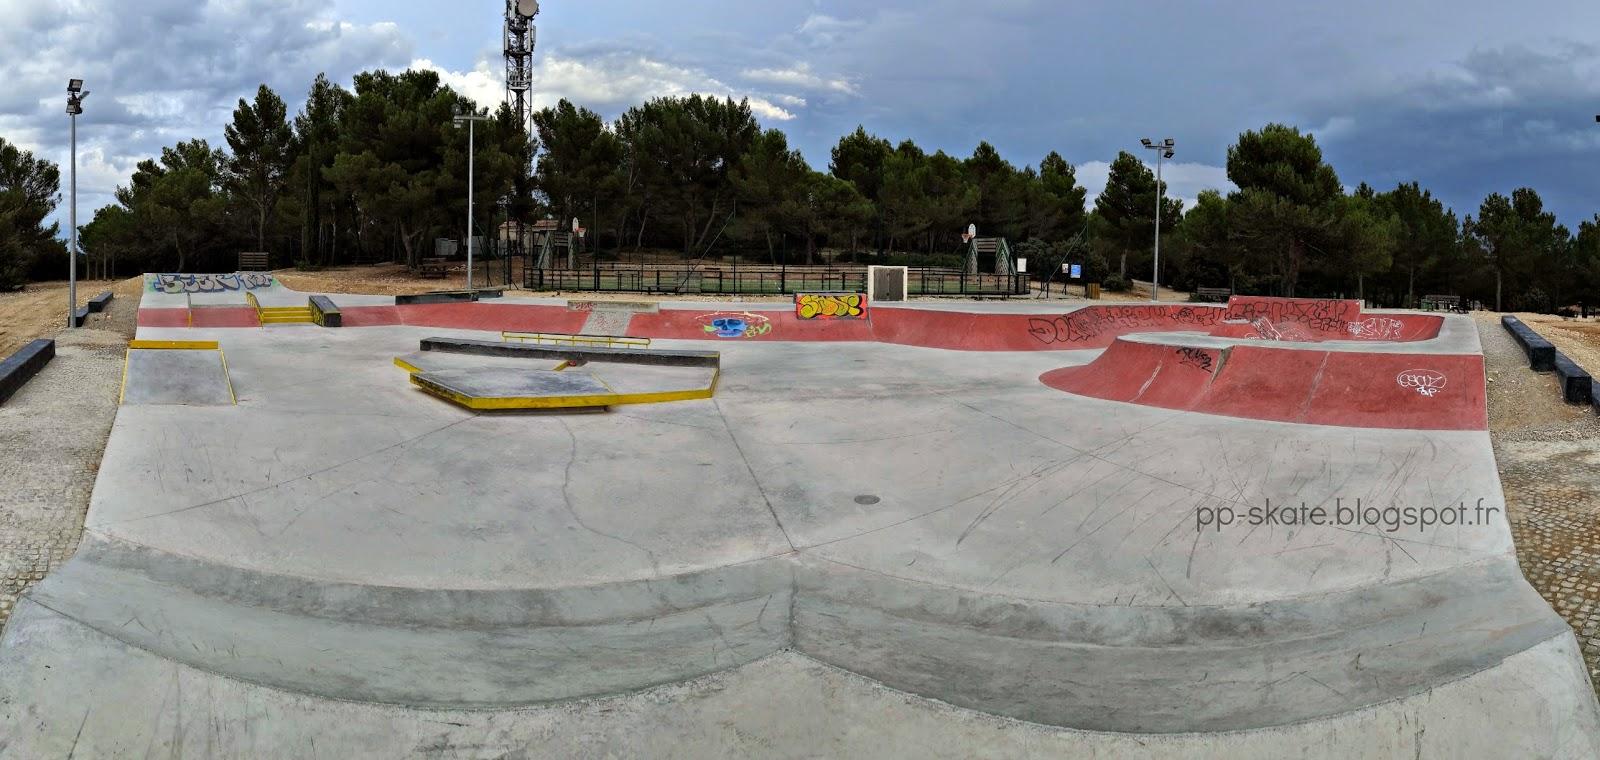 Skatepark Venelles panoramique